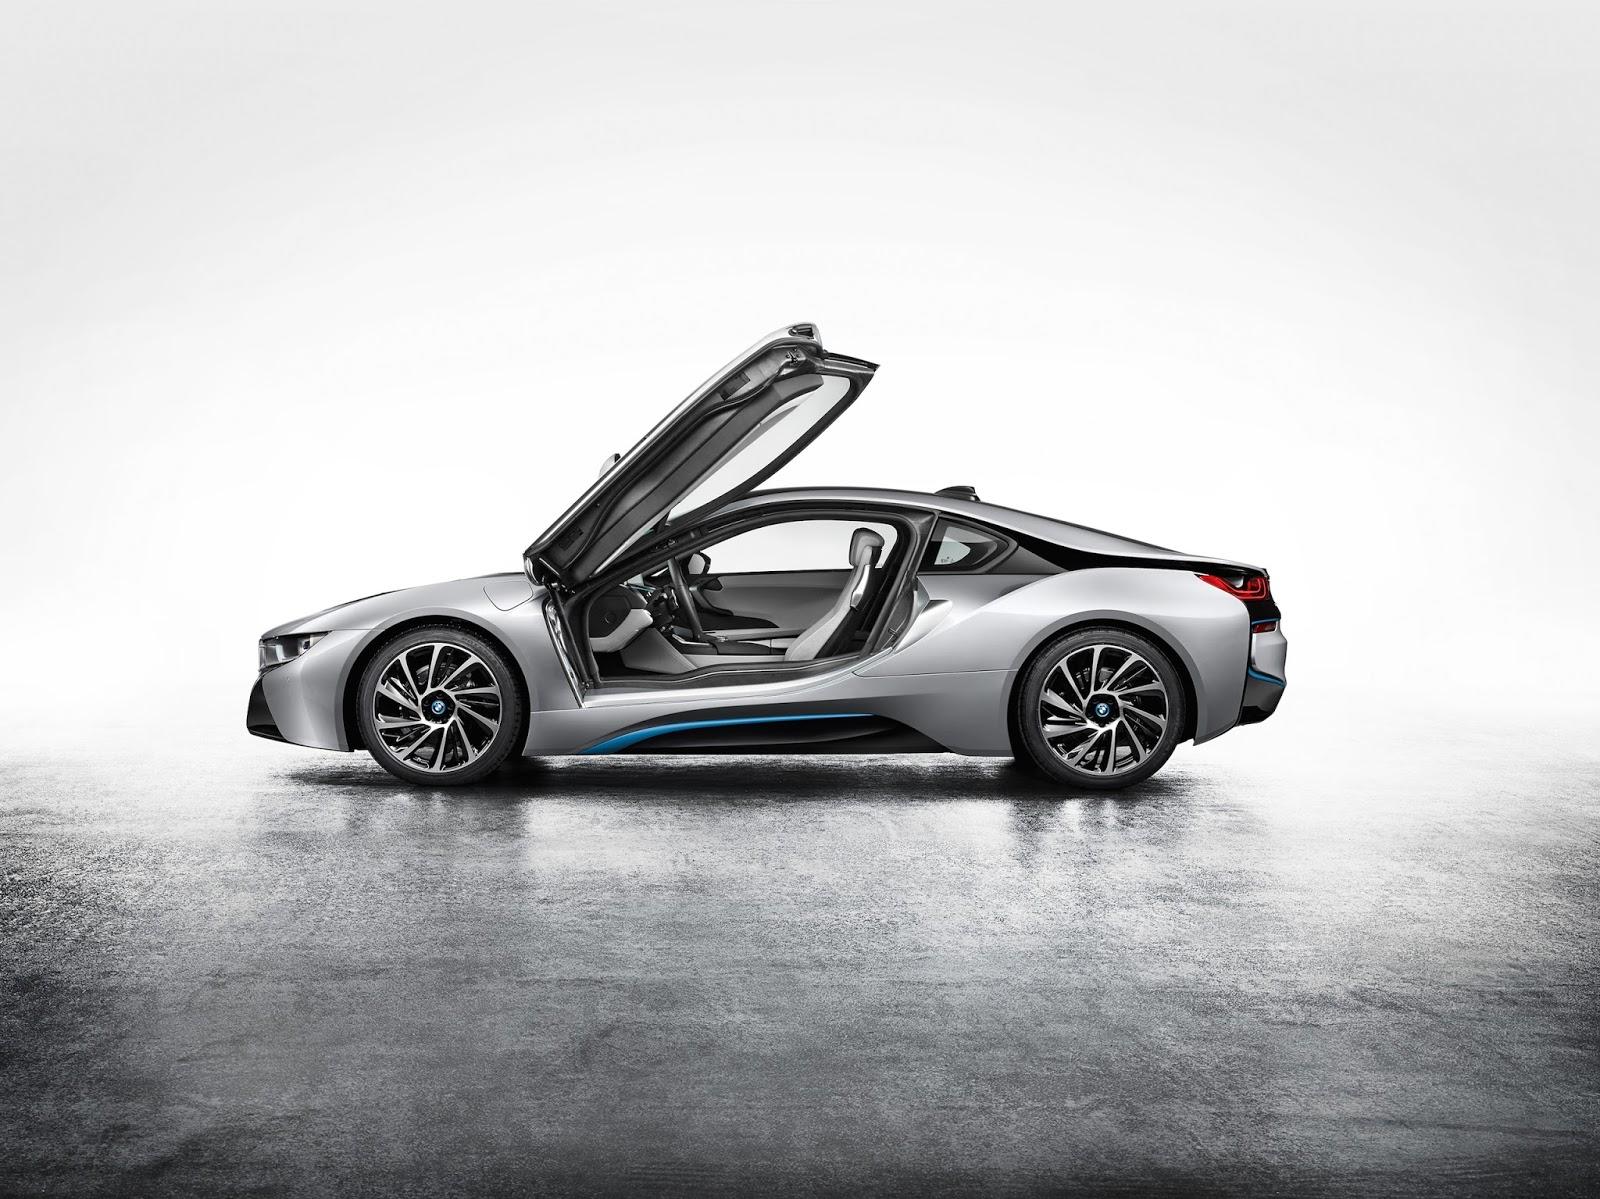 BMWの壁紙(BMW i8)